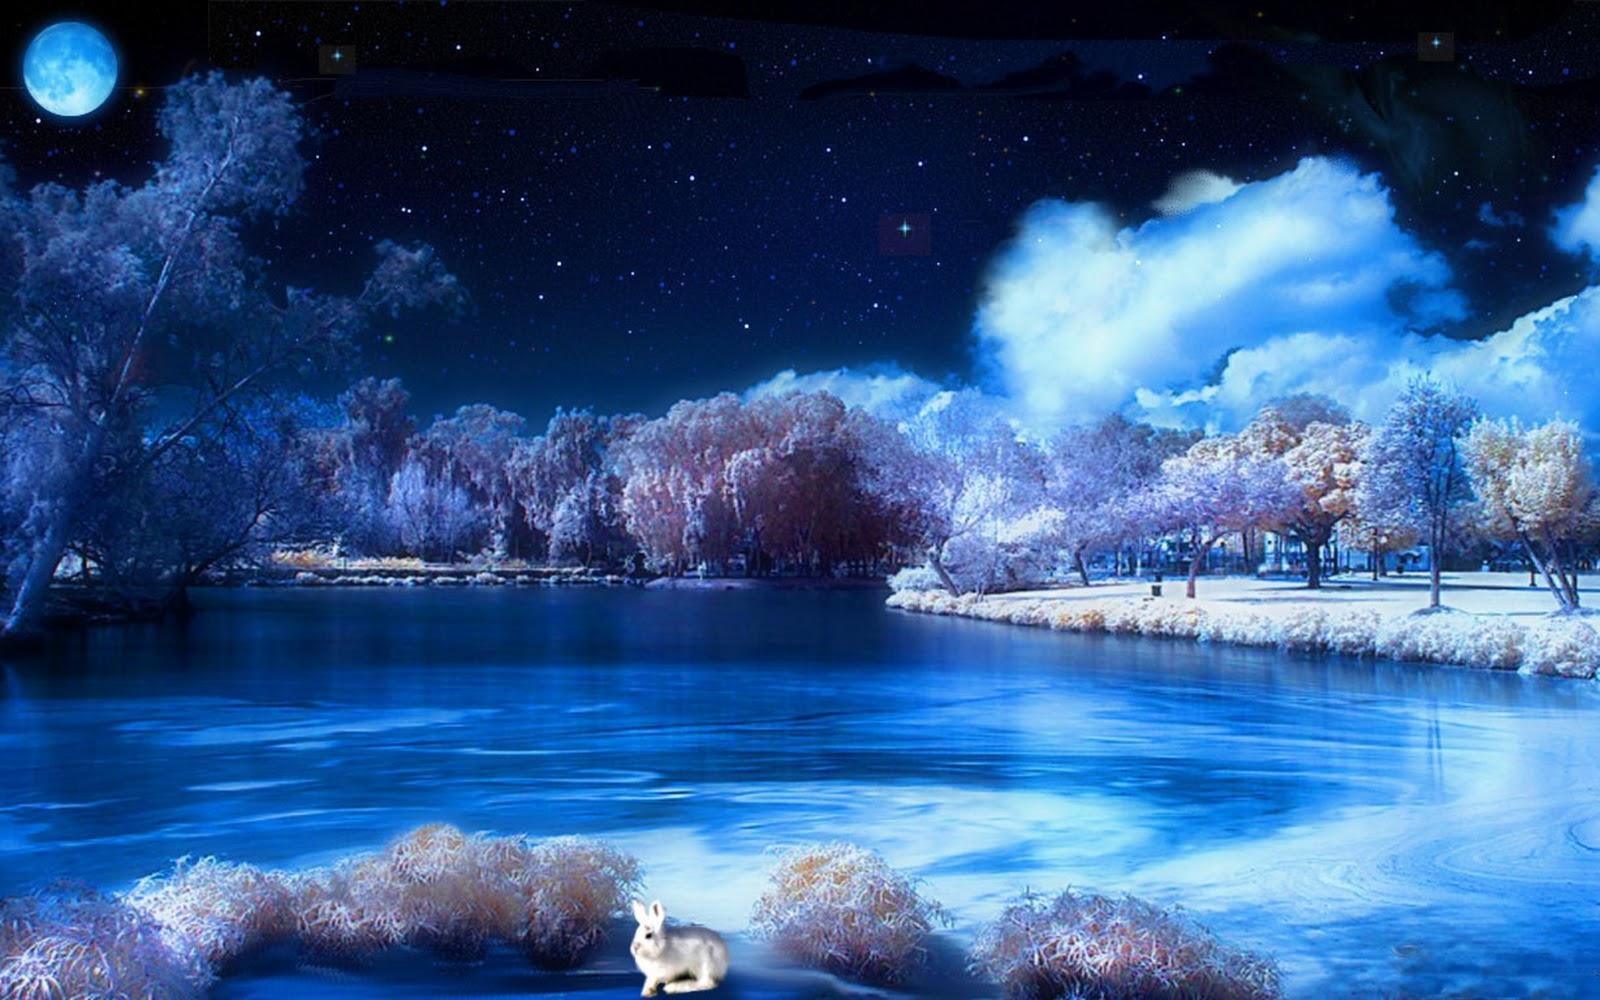 Snowy Winter Night Scenes Wallpaper WallpaperSafari